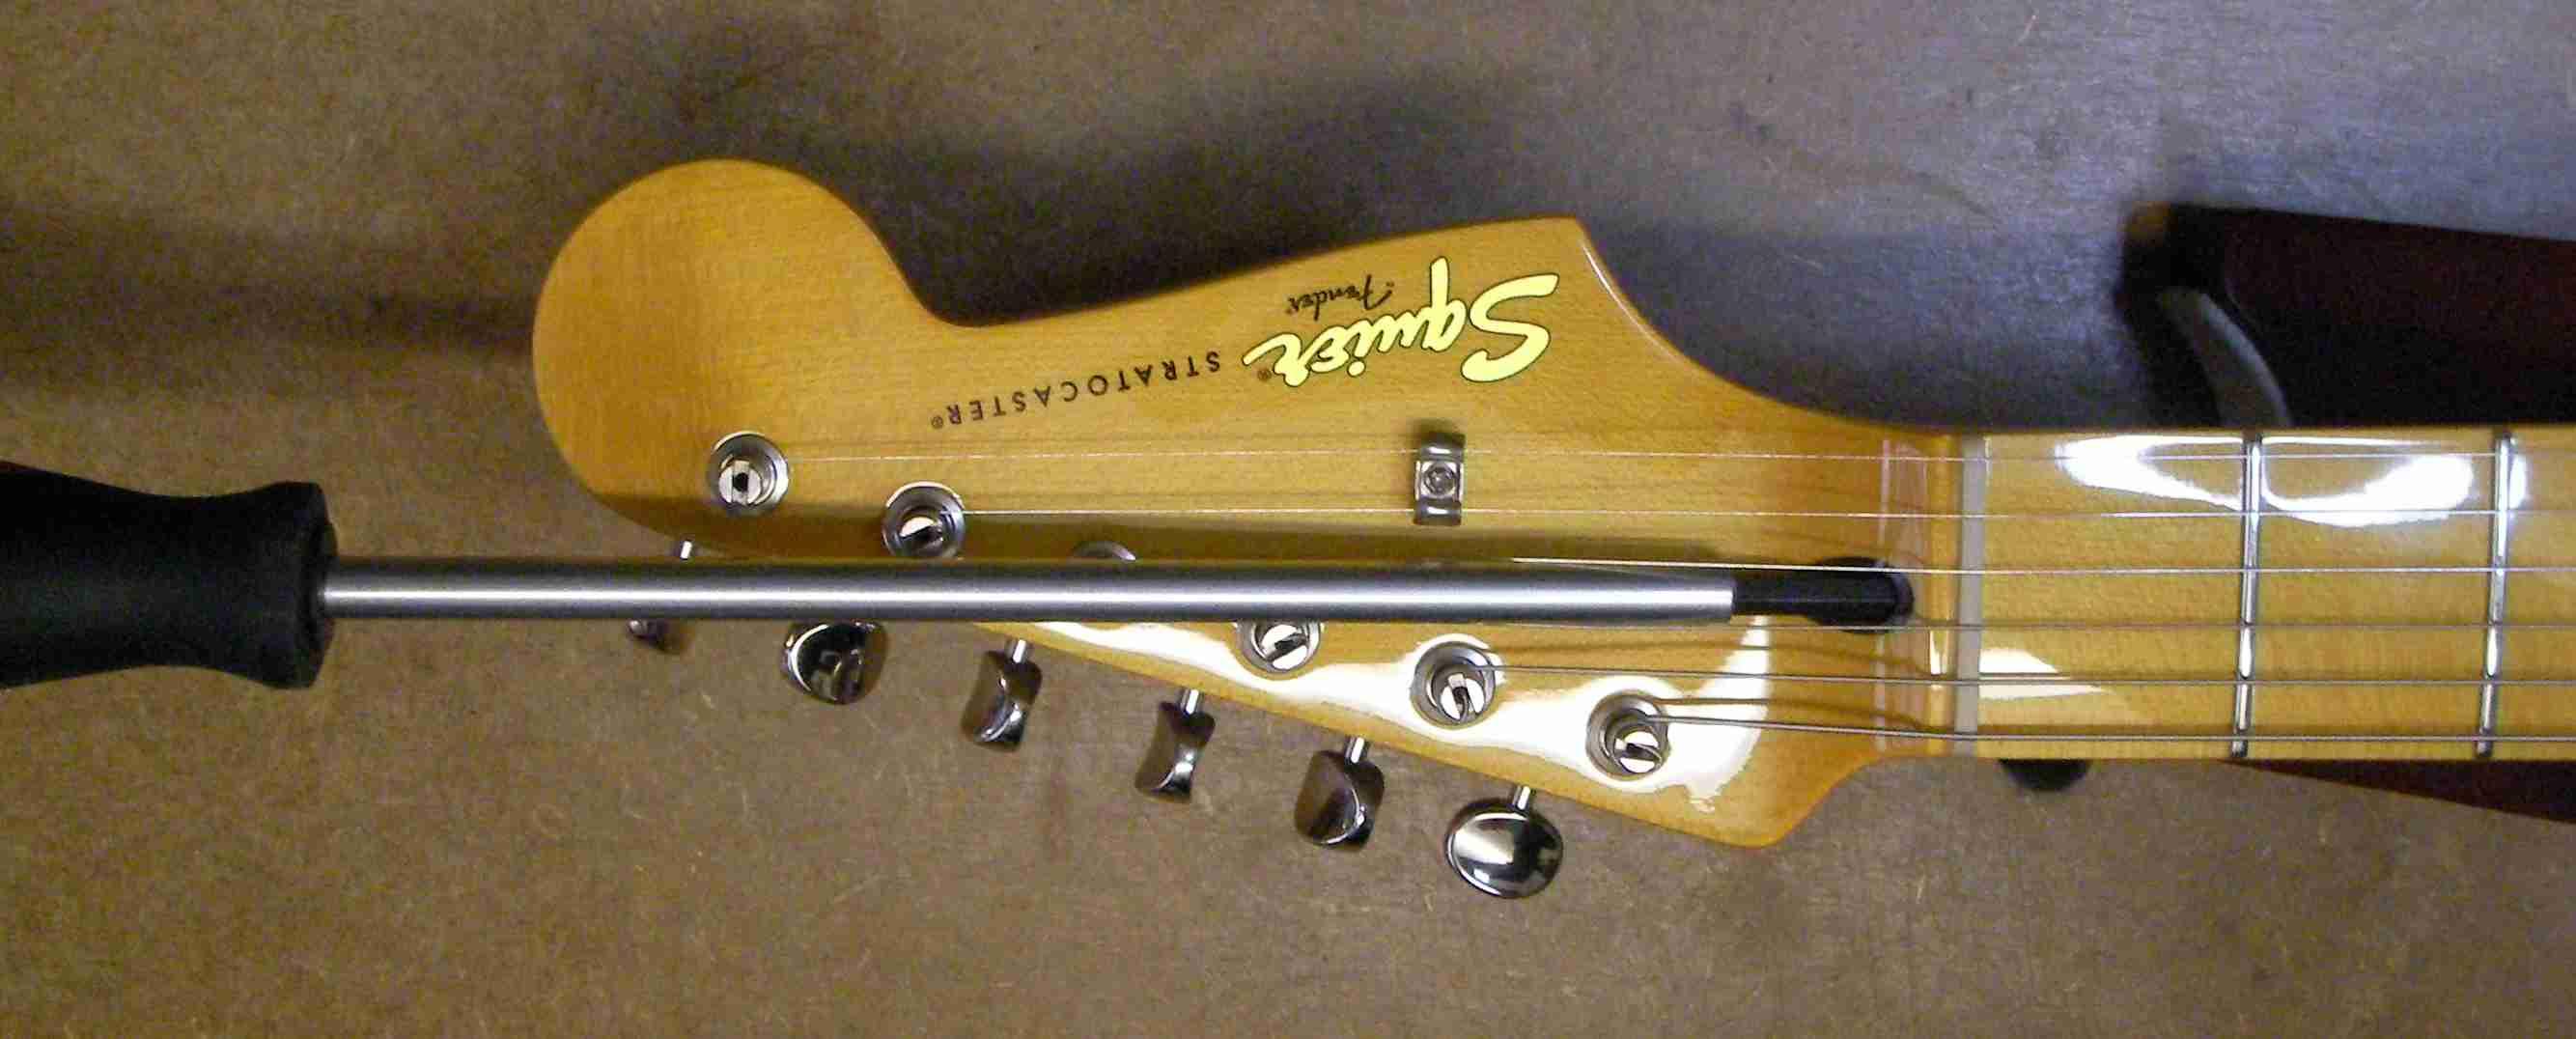 electric guitar bridge height adjustment archives guitar george. Black Bedroom Furniture Sets. Home Design Ideas